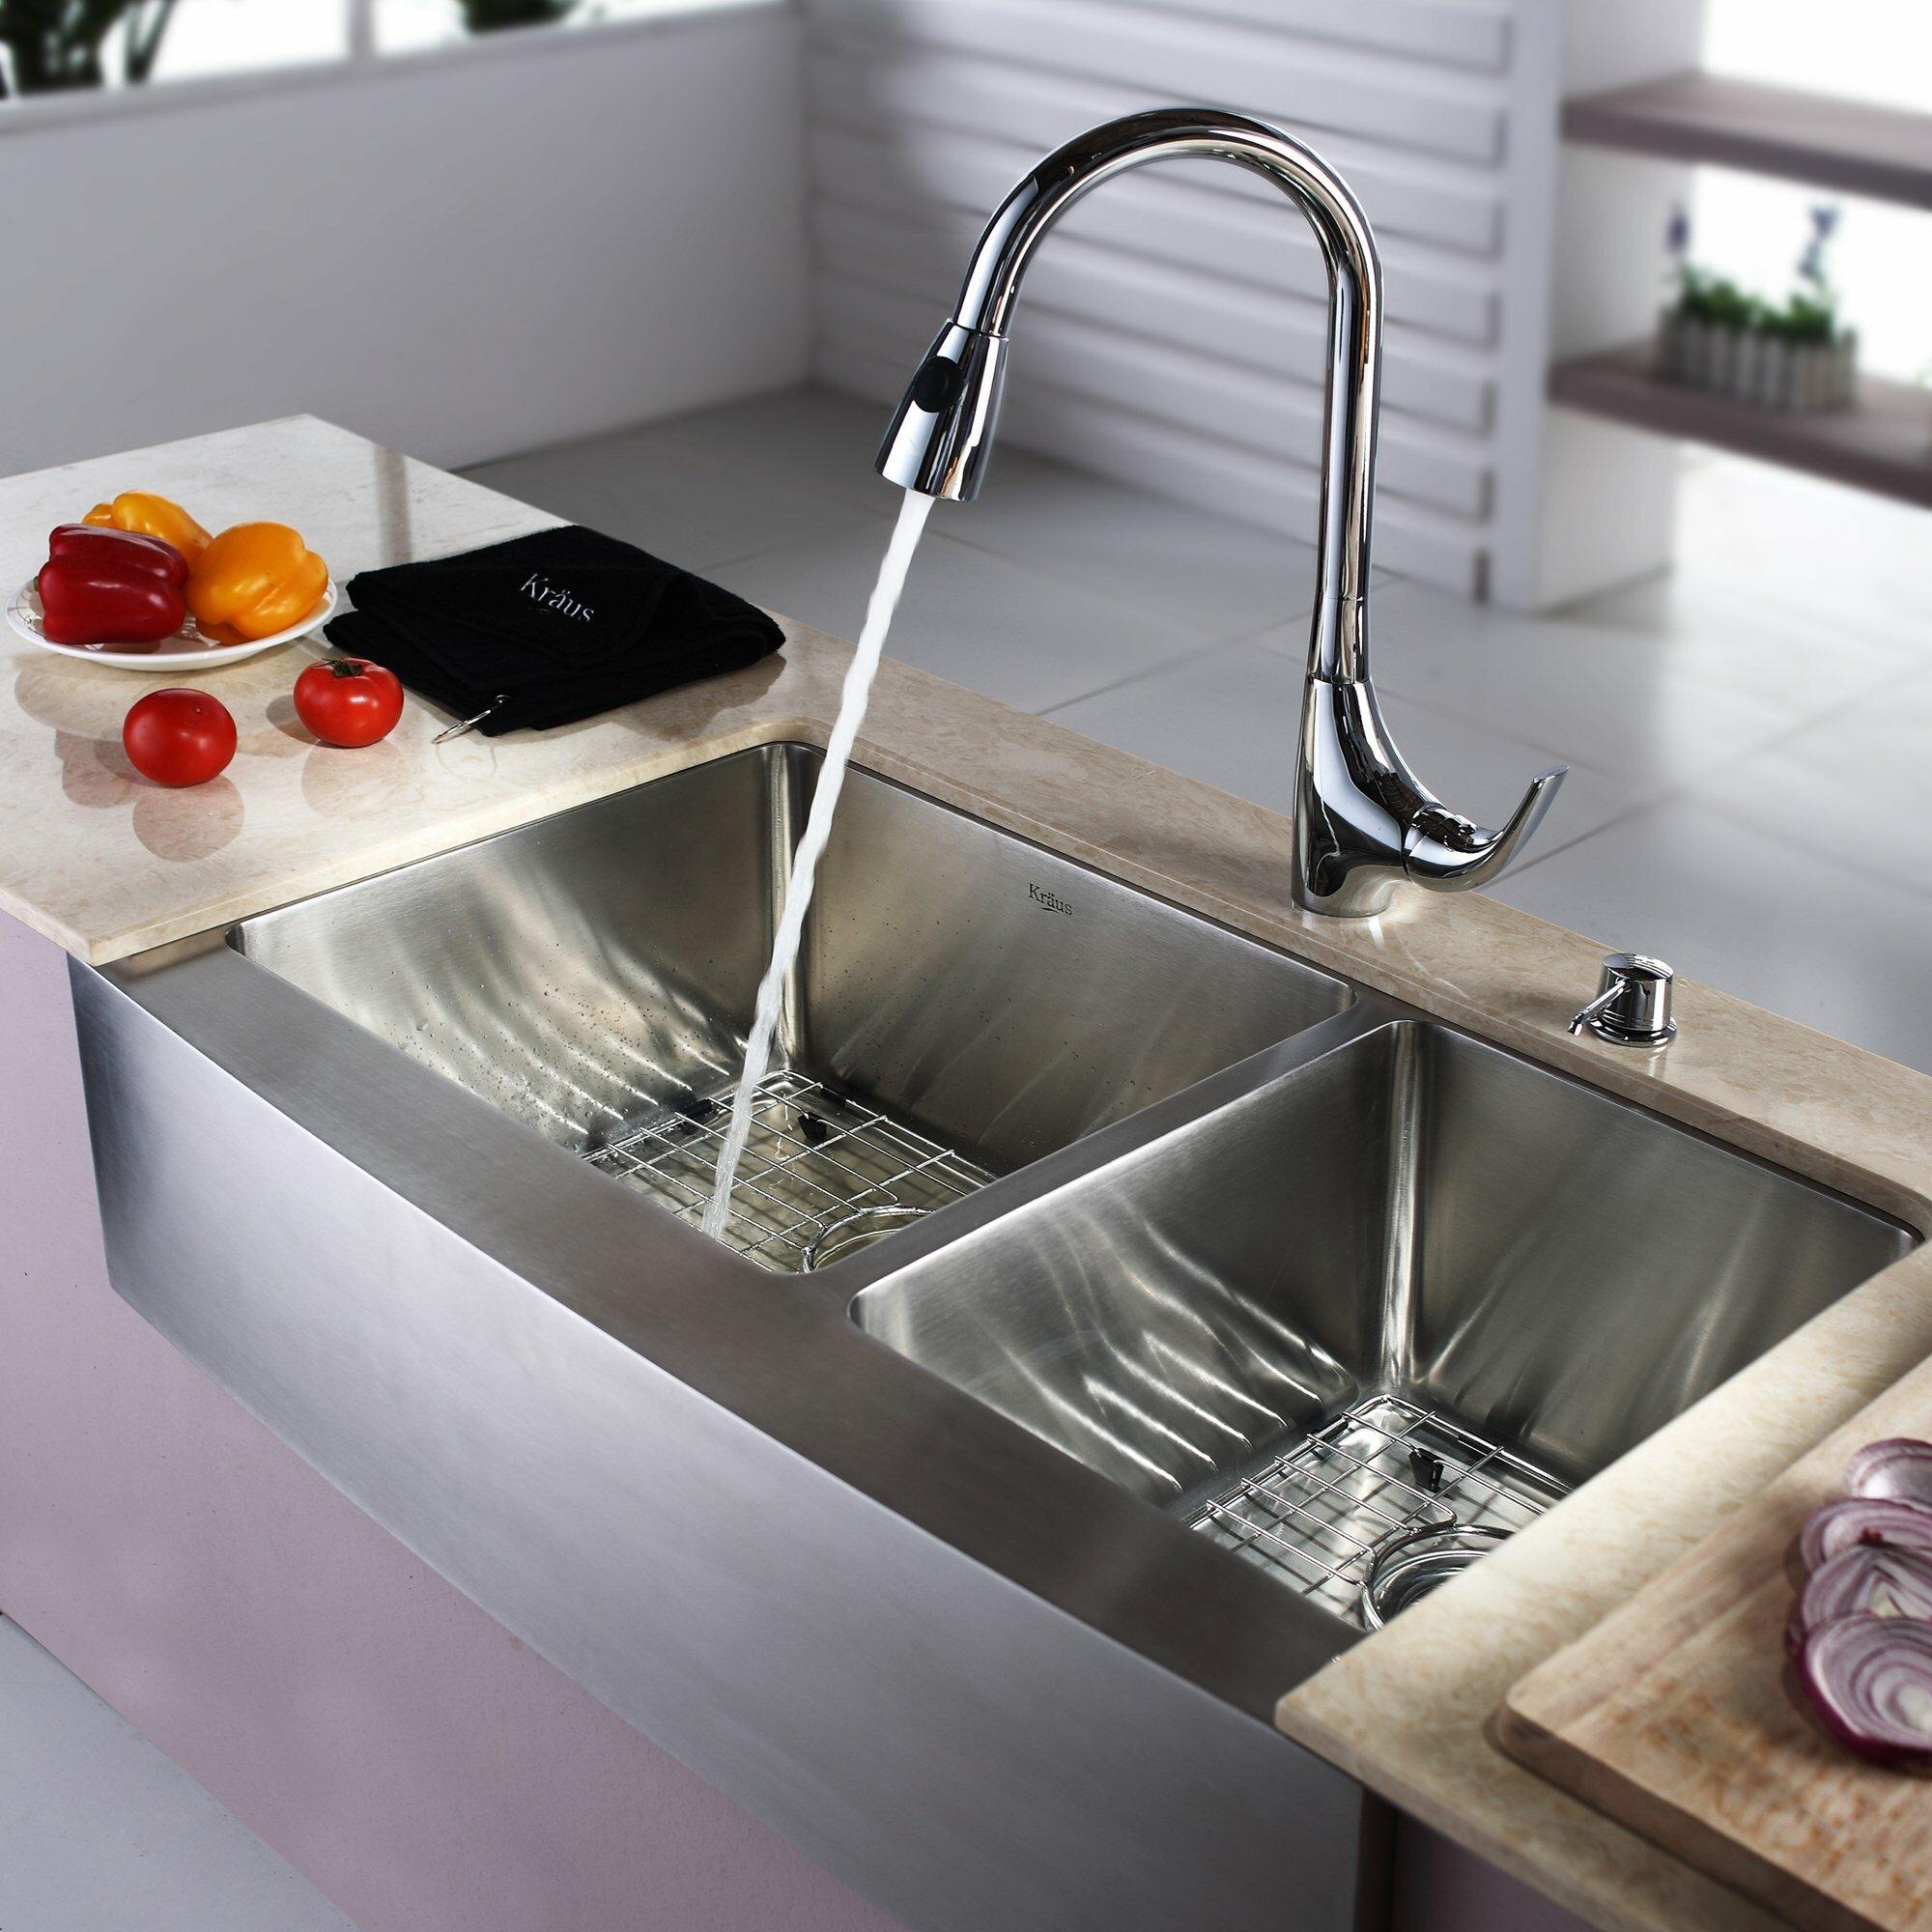 32 Farmhouse Sink : 32.88